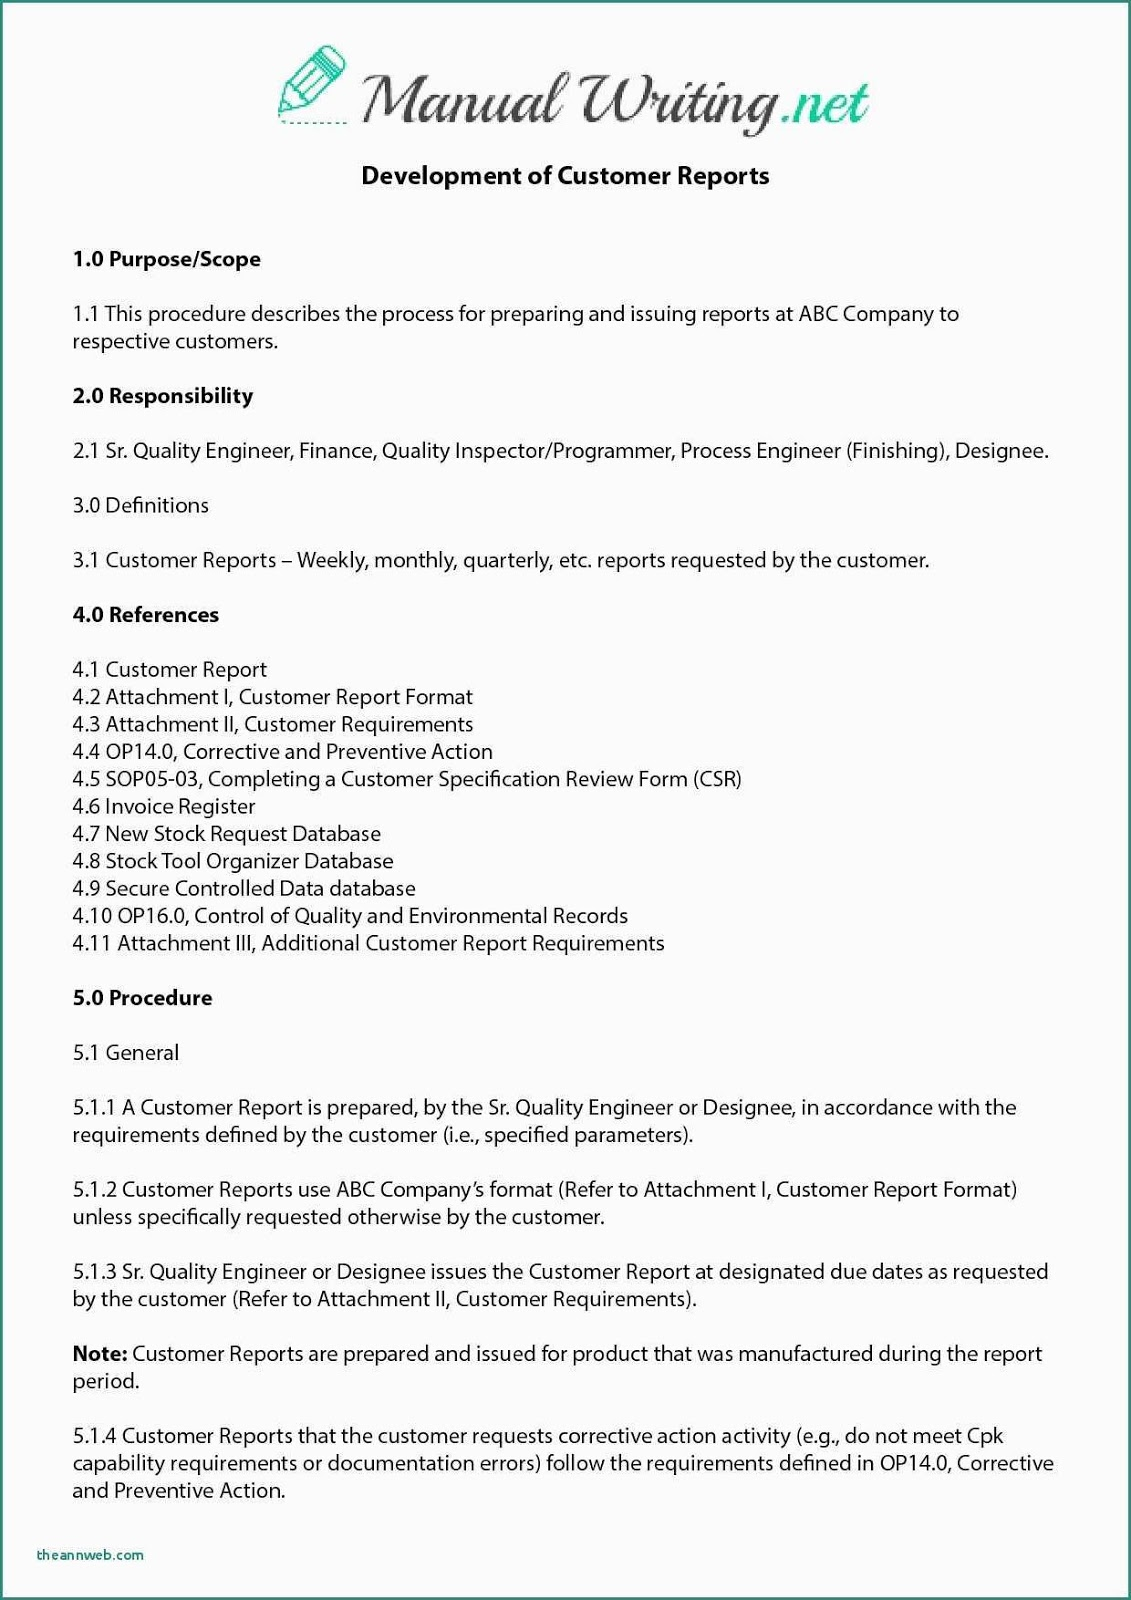 Mechanical Engineering CV Format, mechanical engineering cv format for fresher pdf, mechanical engineering cv format word, mechanical engineering cv format for fresher, mechanical engineering cv format, Mechanical Engineering CV Format 2019